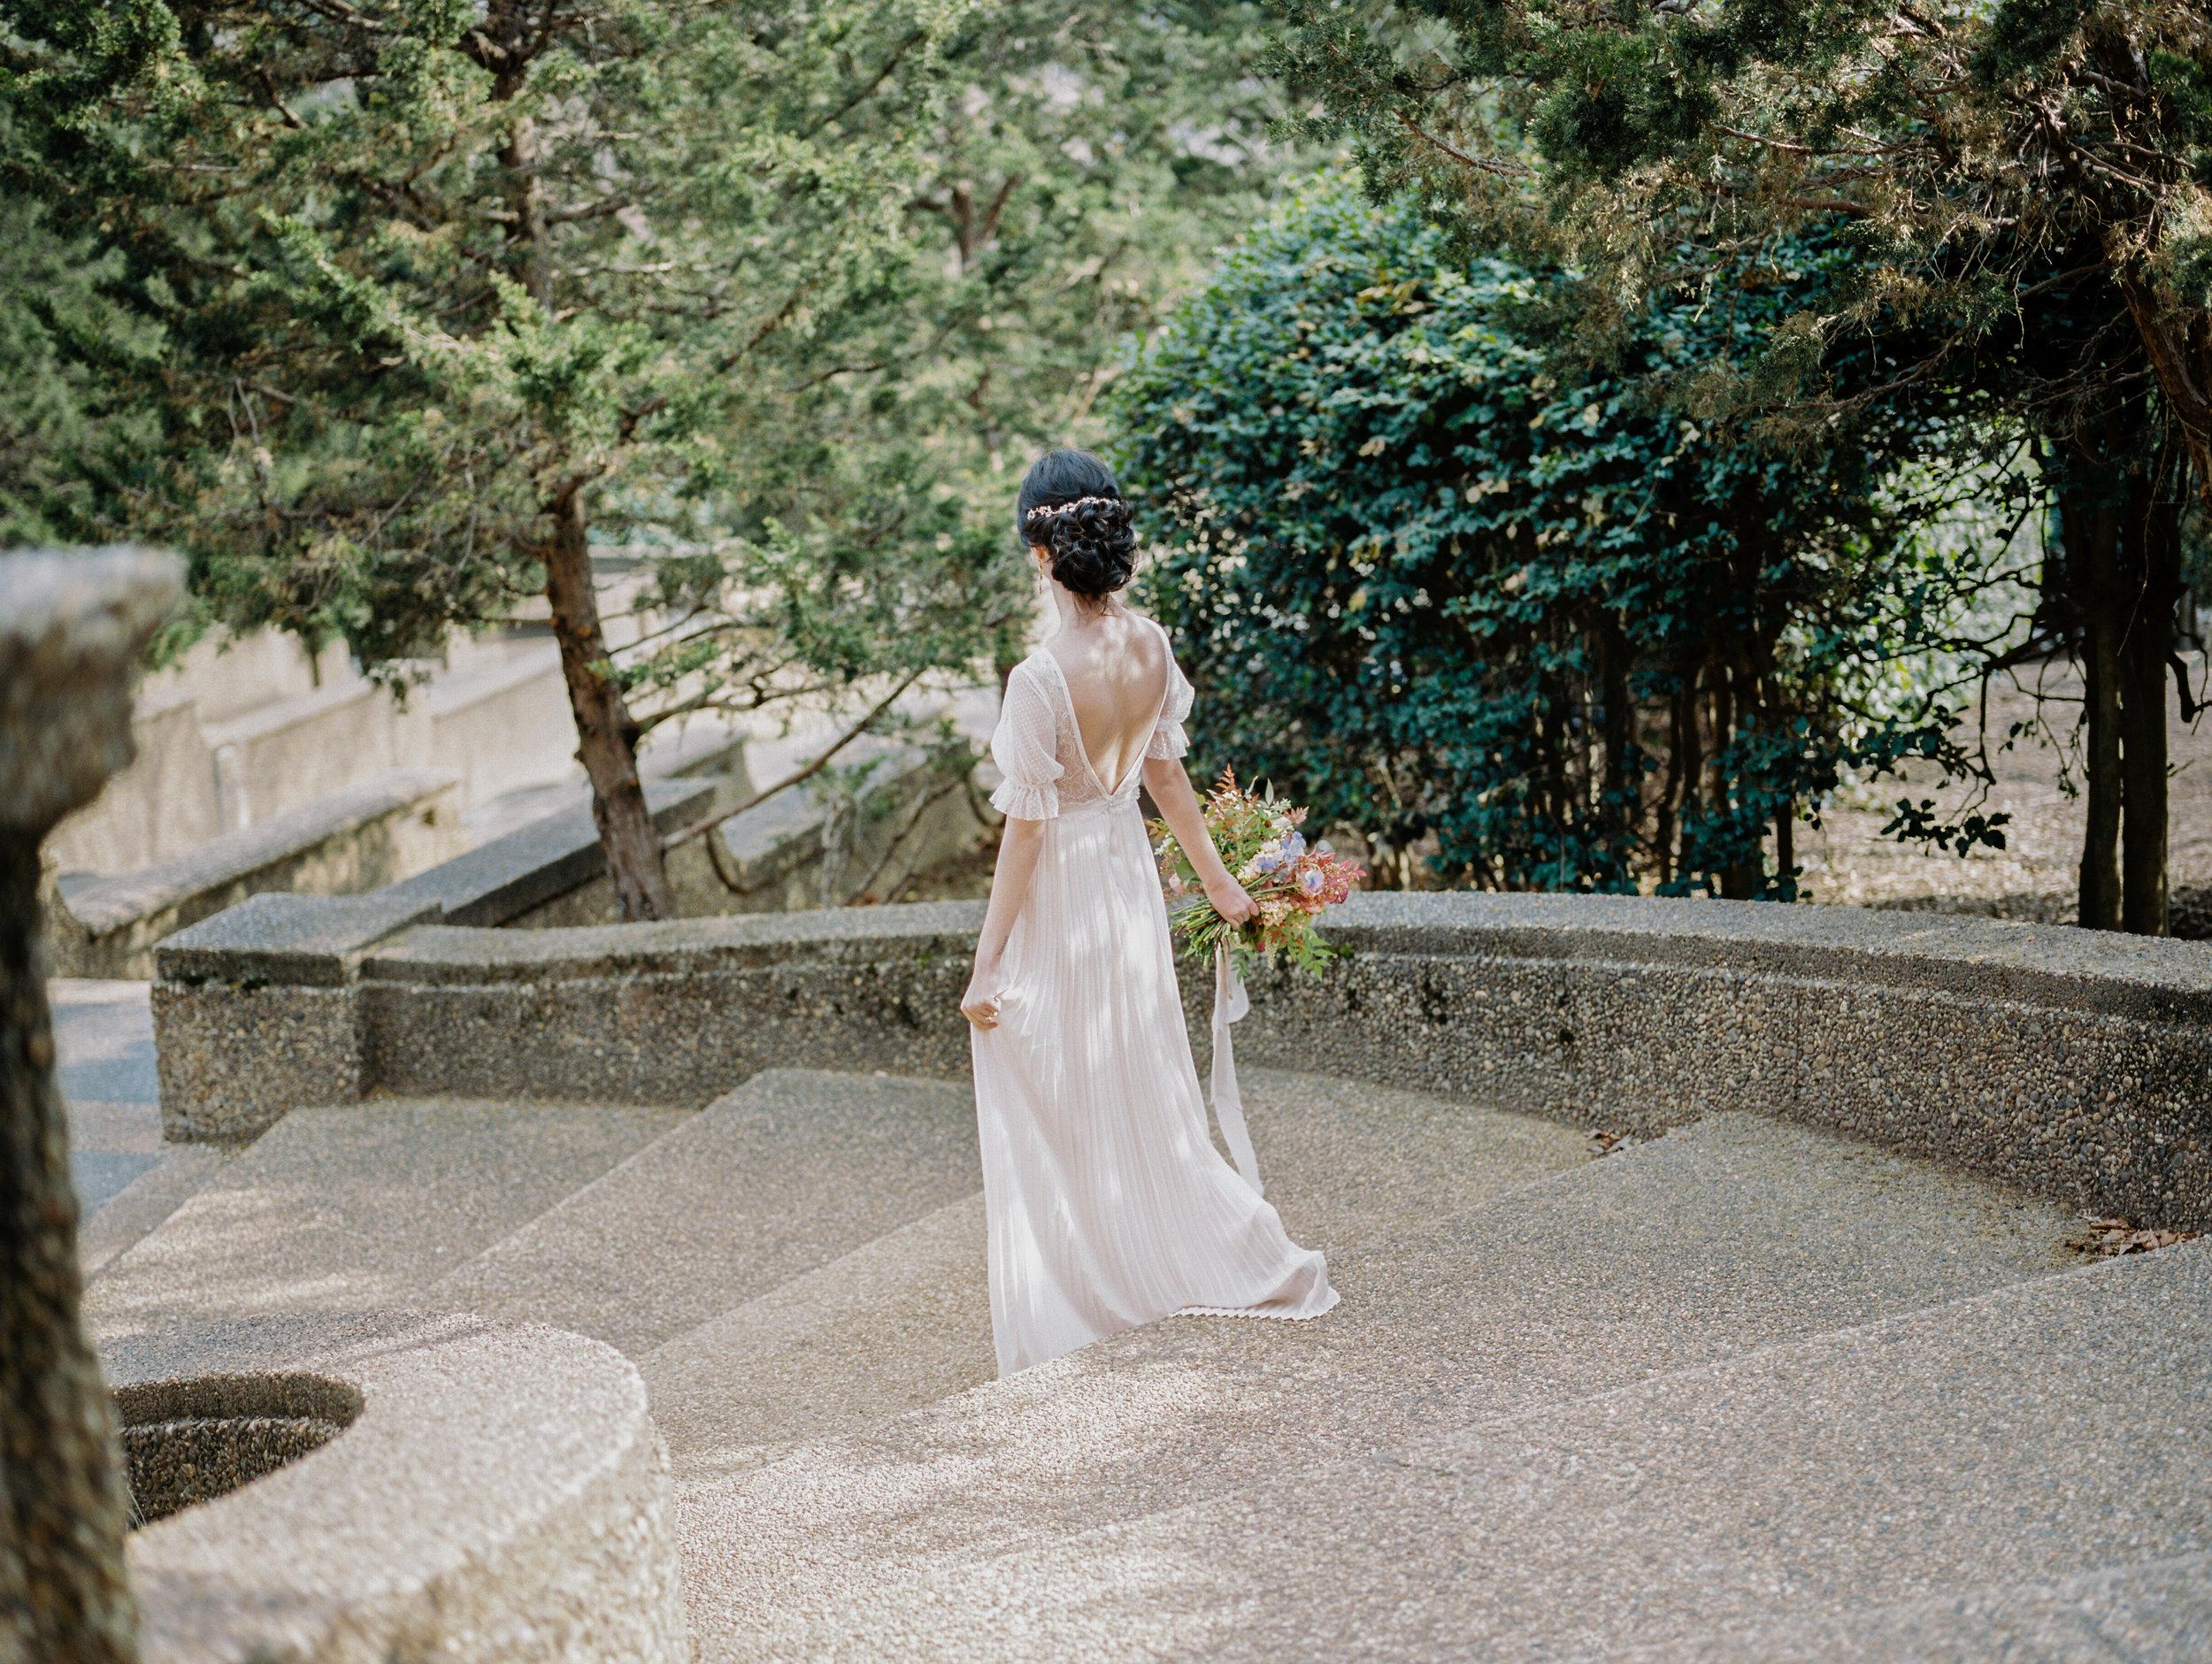 meridian-hill-park-bridal-portraits-dc